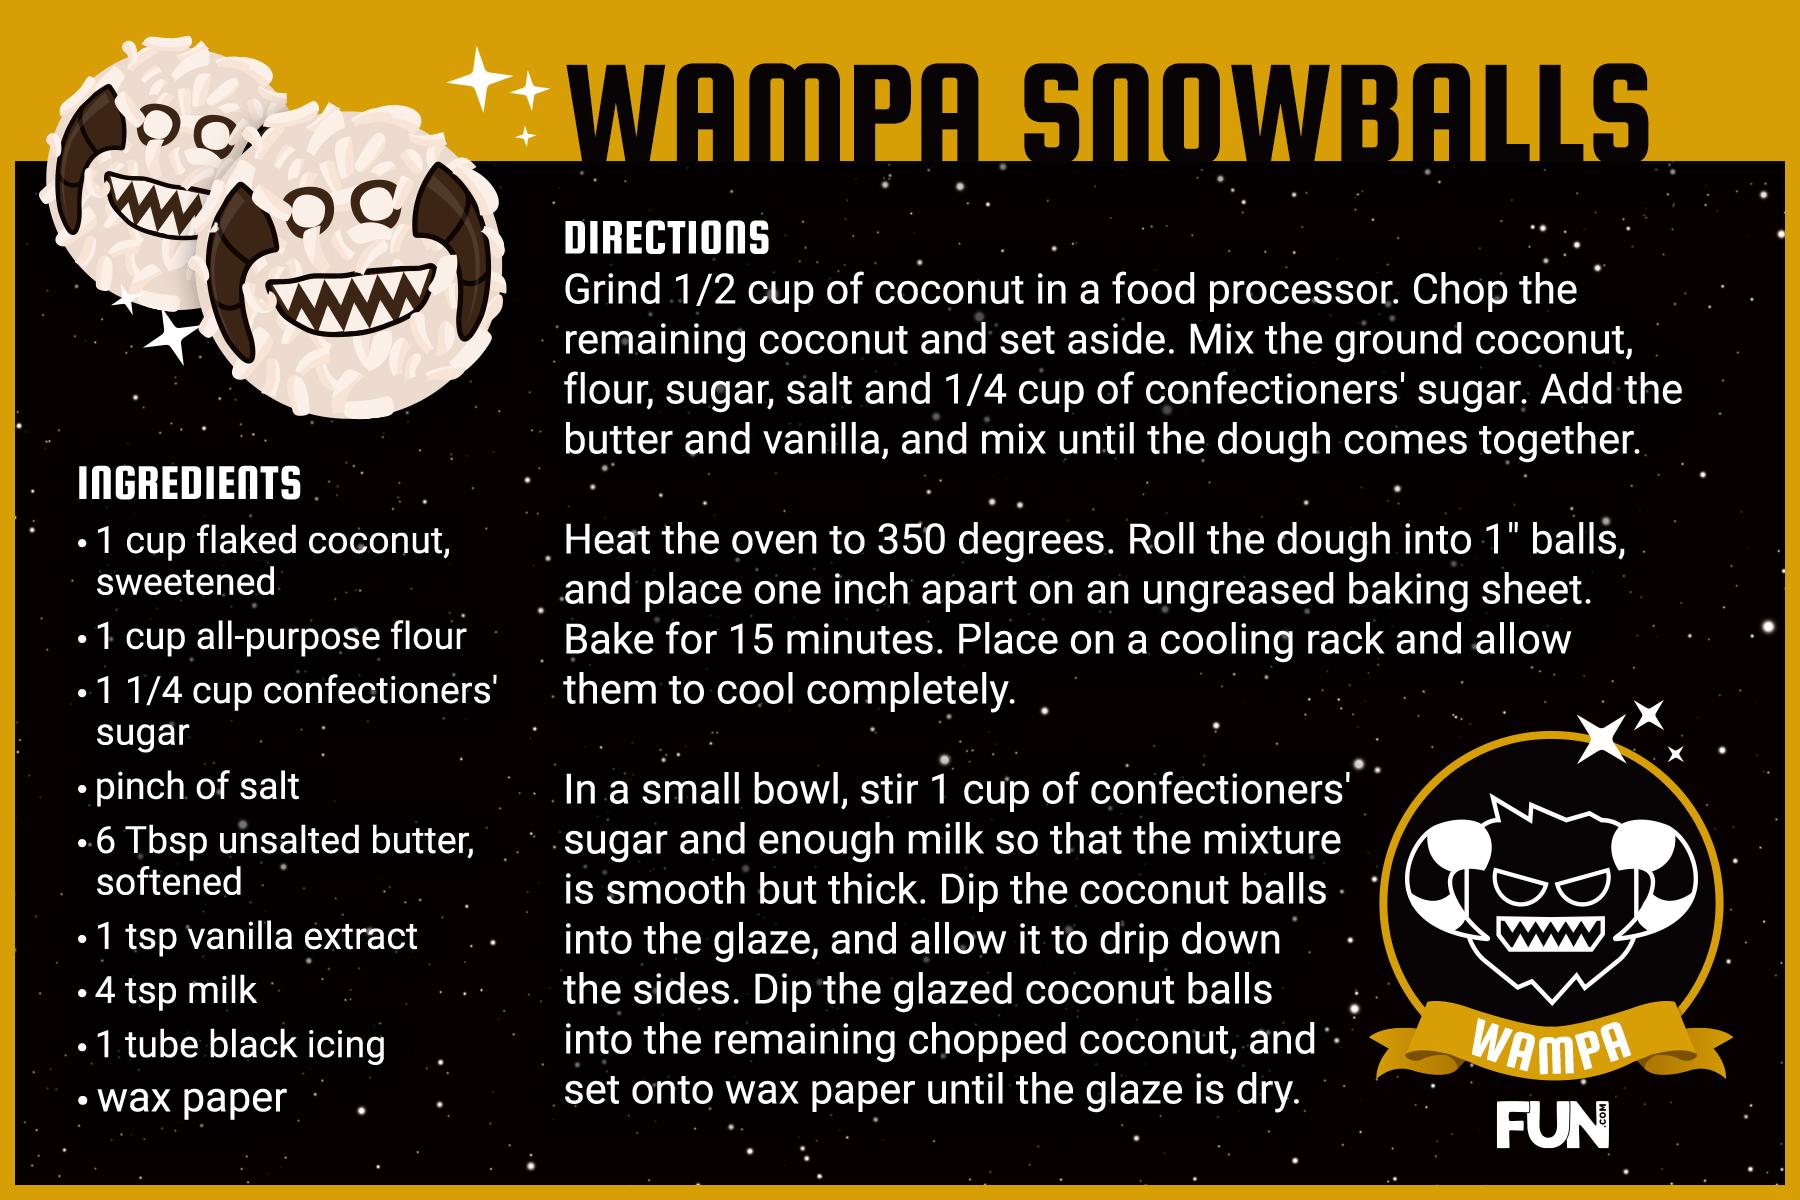 Wampa Snowballs Recipe